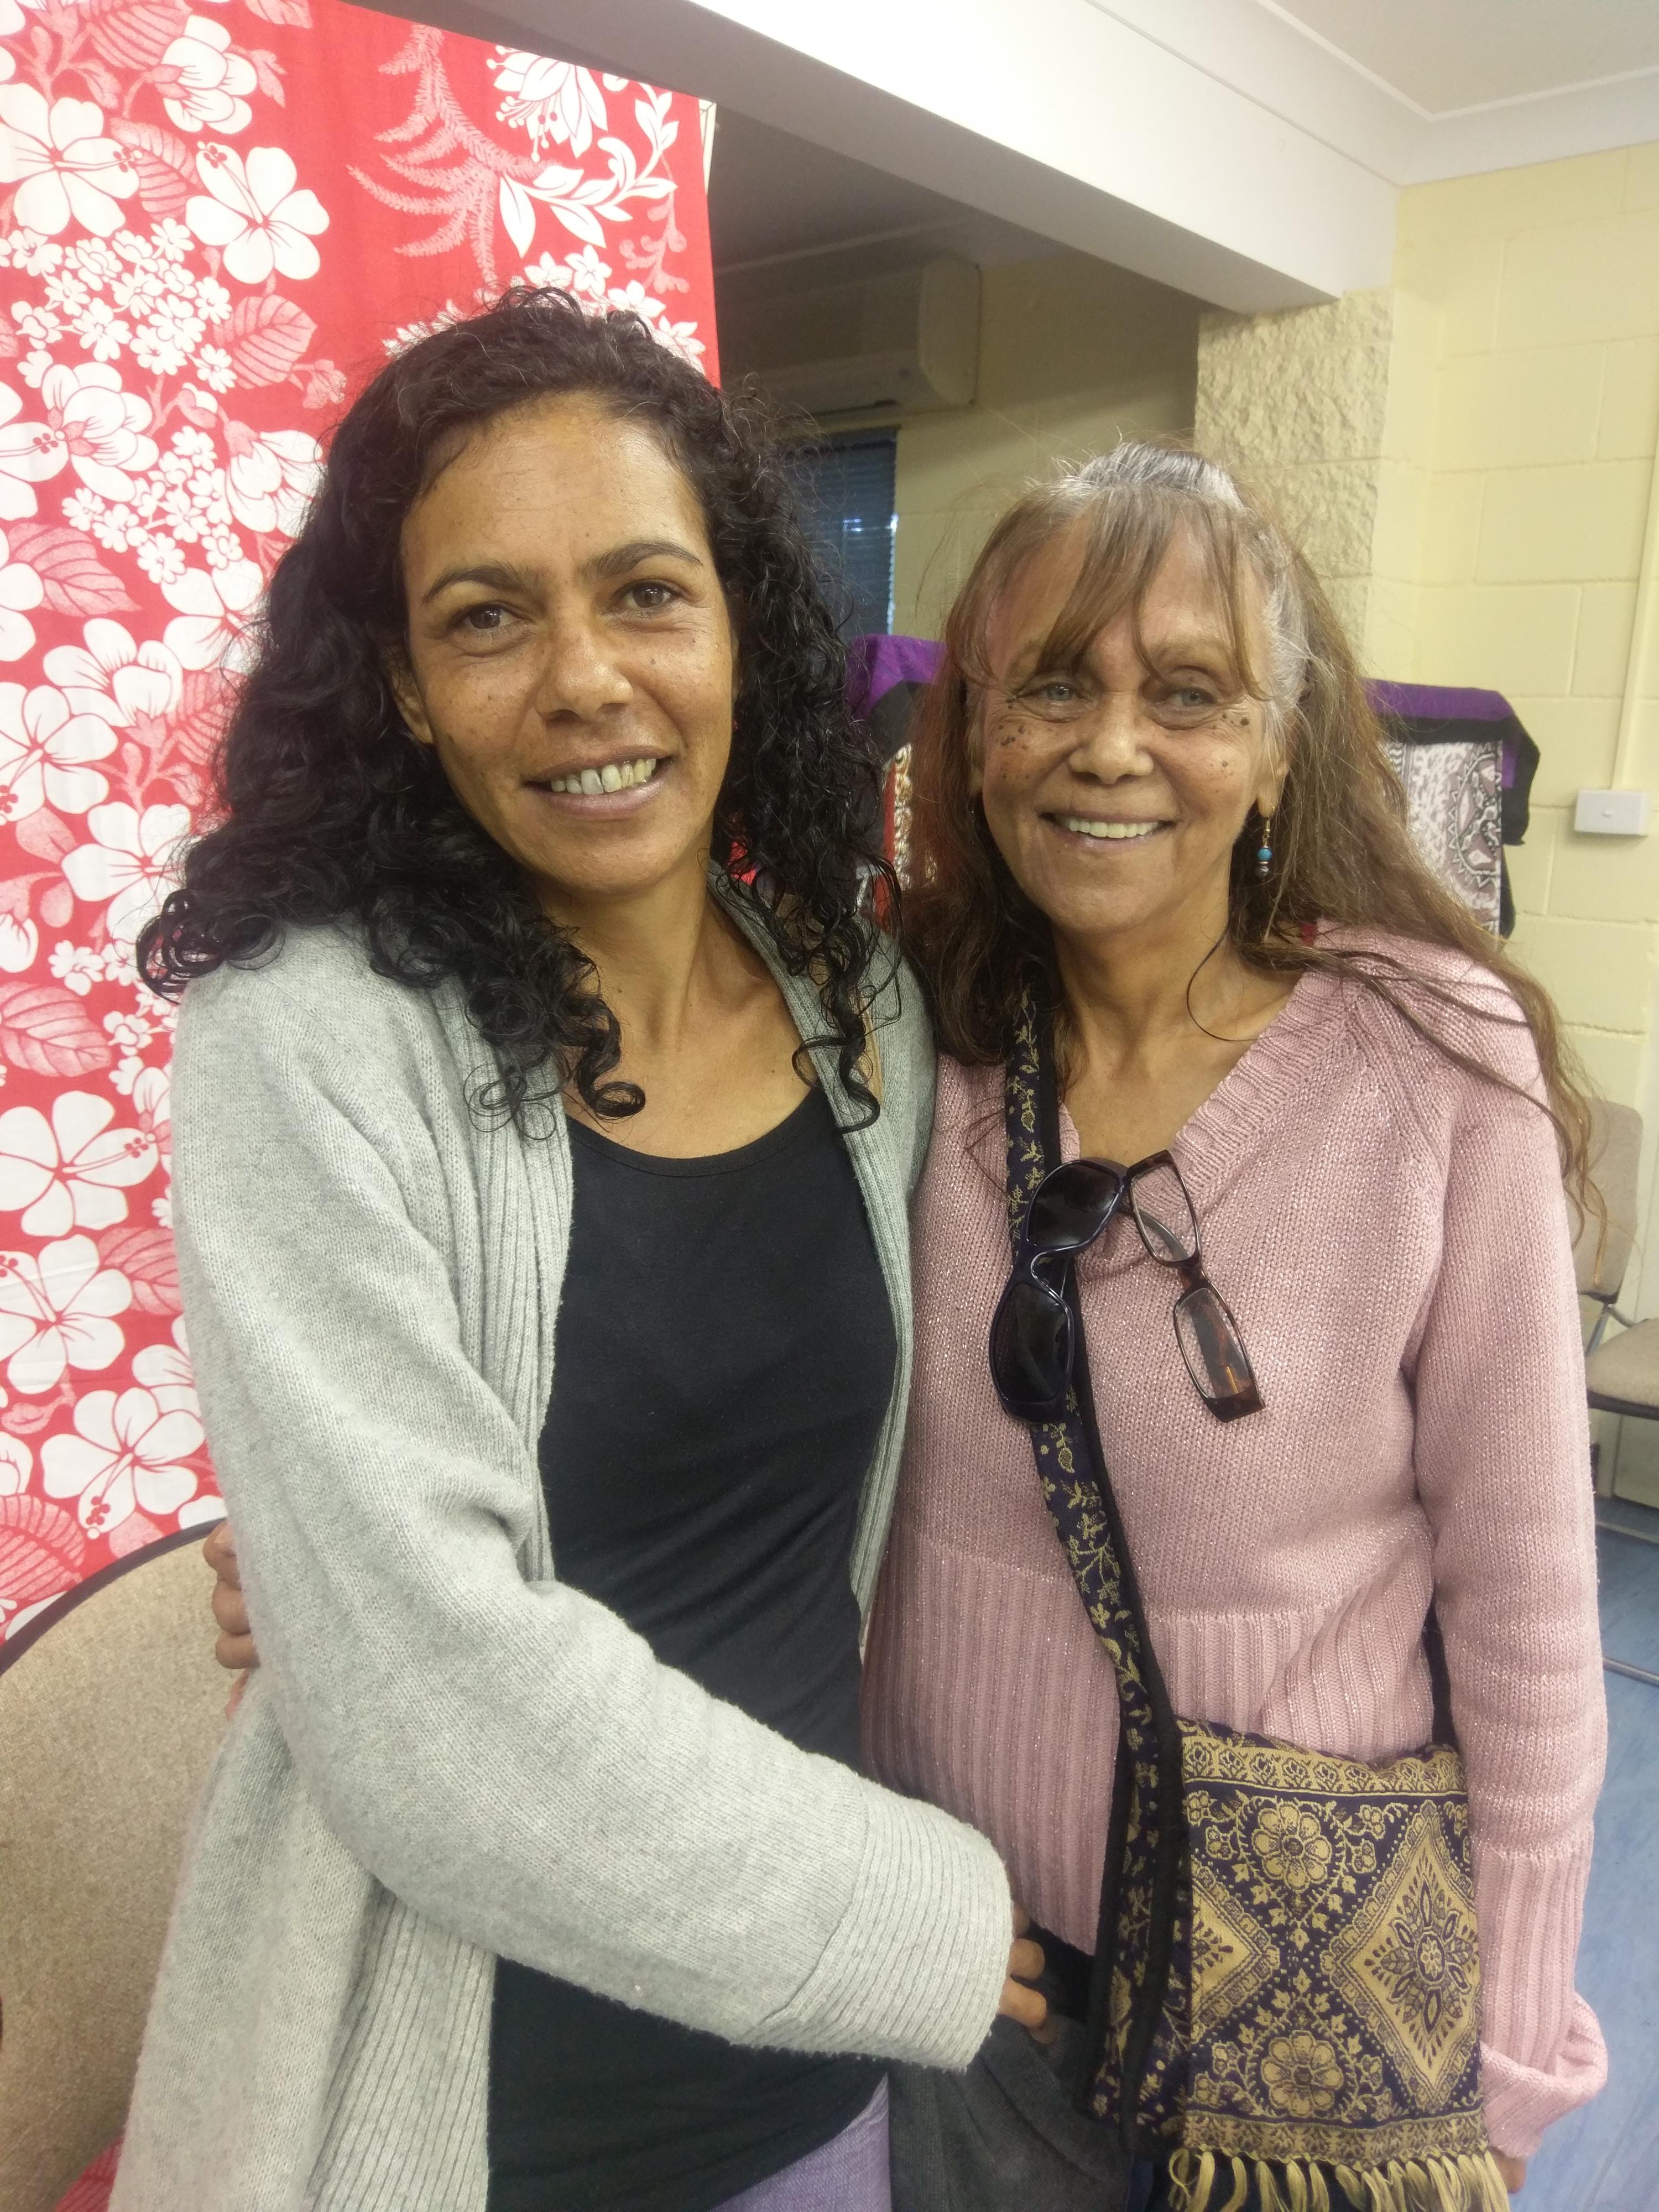 Edrica & Felicia Naidoc 2017 Womens Day